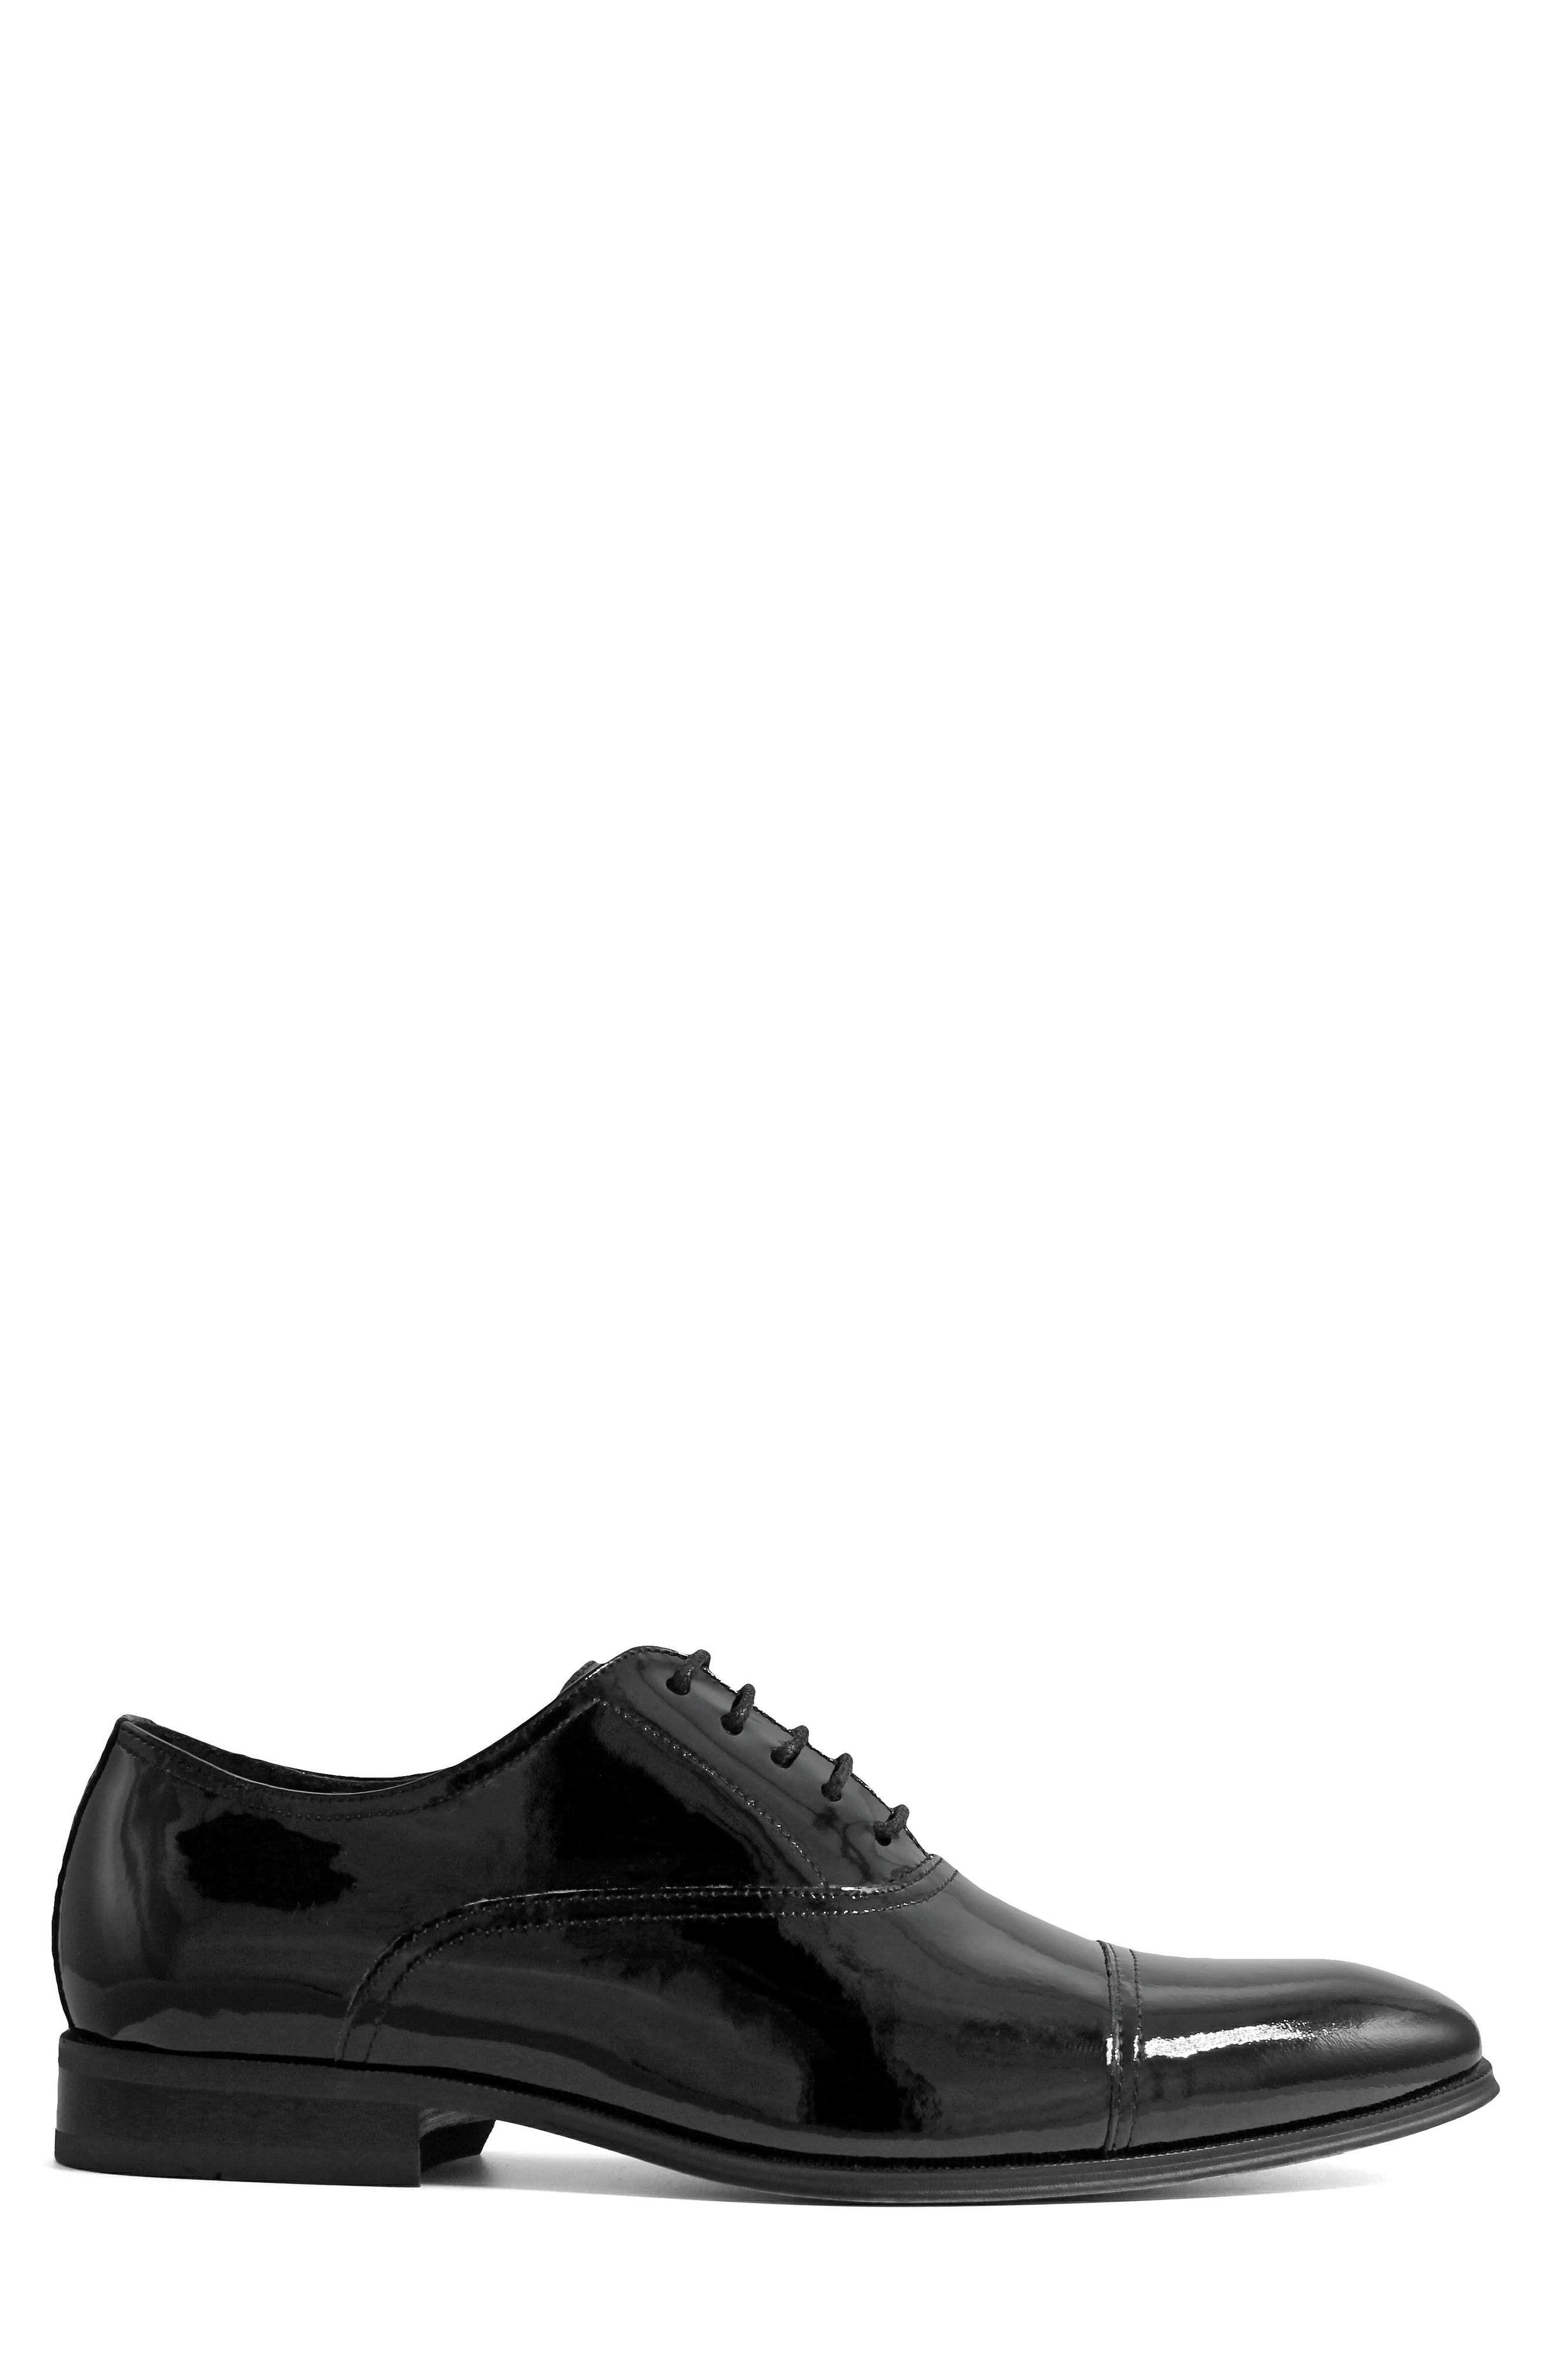 Tux Cap Toe Oxford,                             Alternate thumbnail 3, color,                             Black Patent Leather